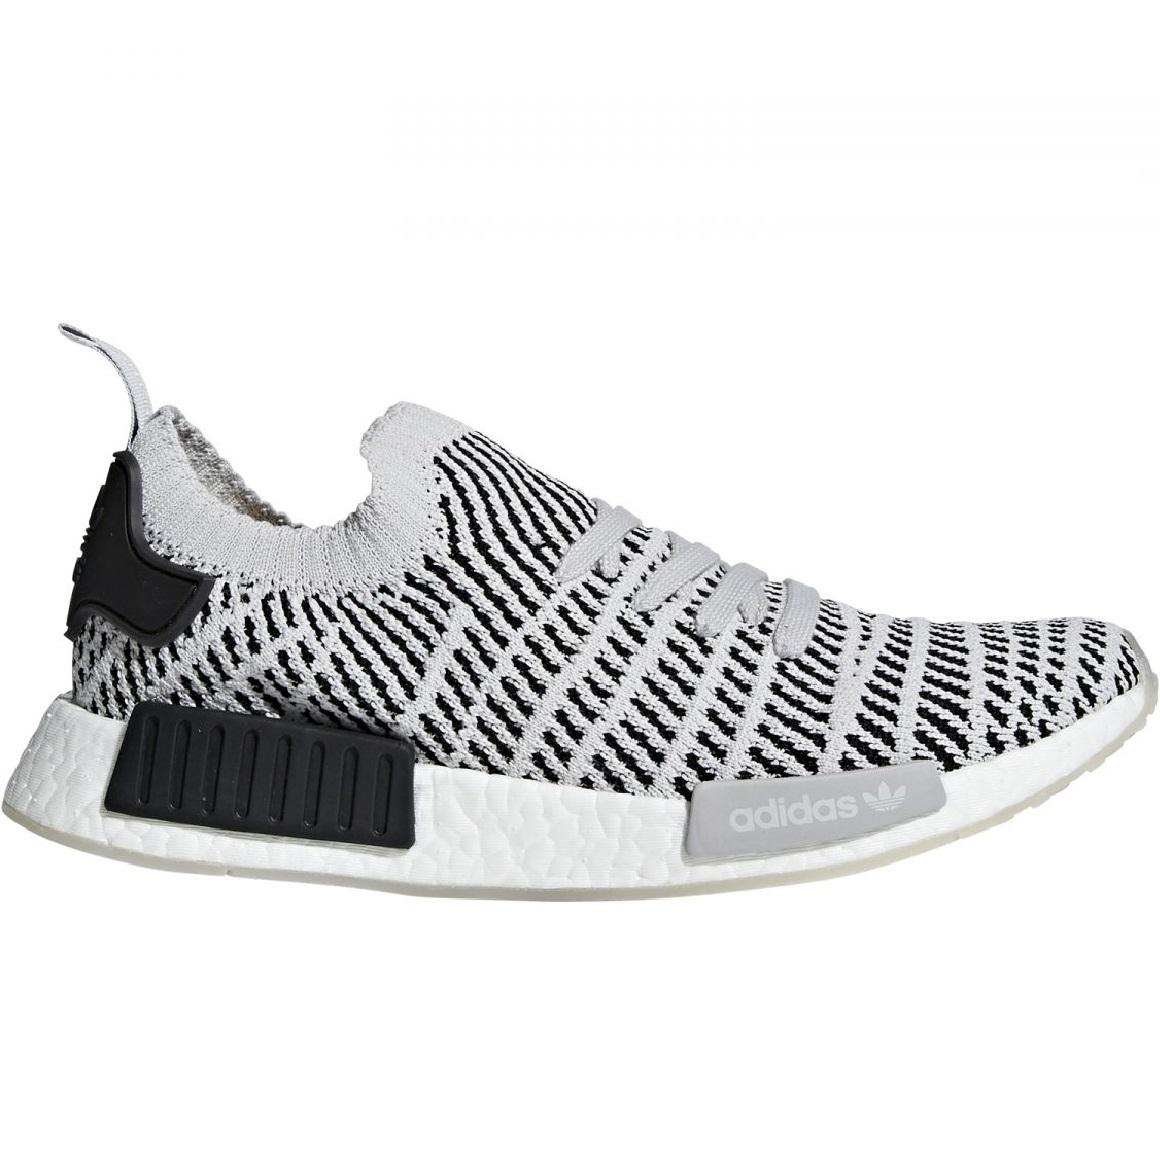 Adidas Originals Nmd R1 Stlt Primeknit Sneaker Herren Schuhe Grau